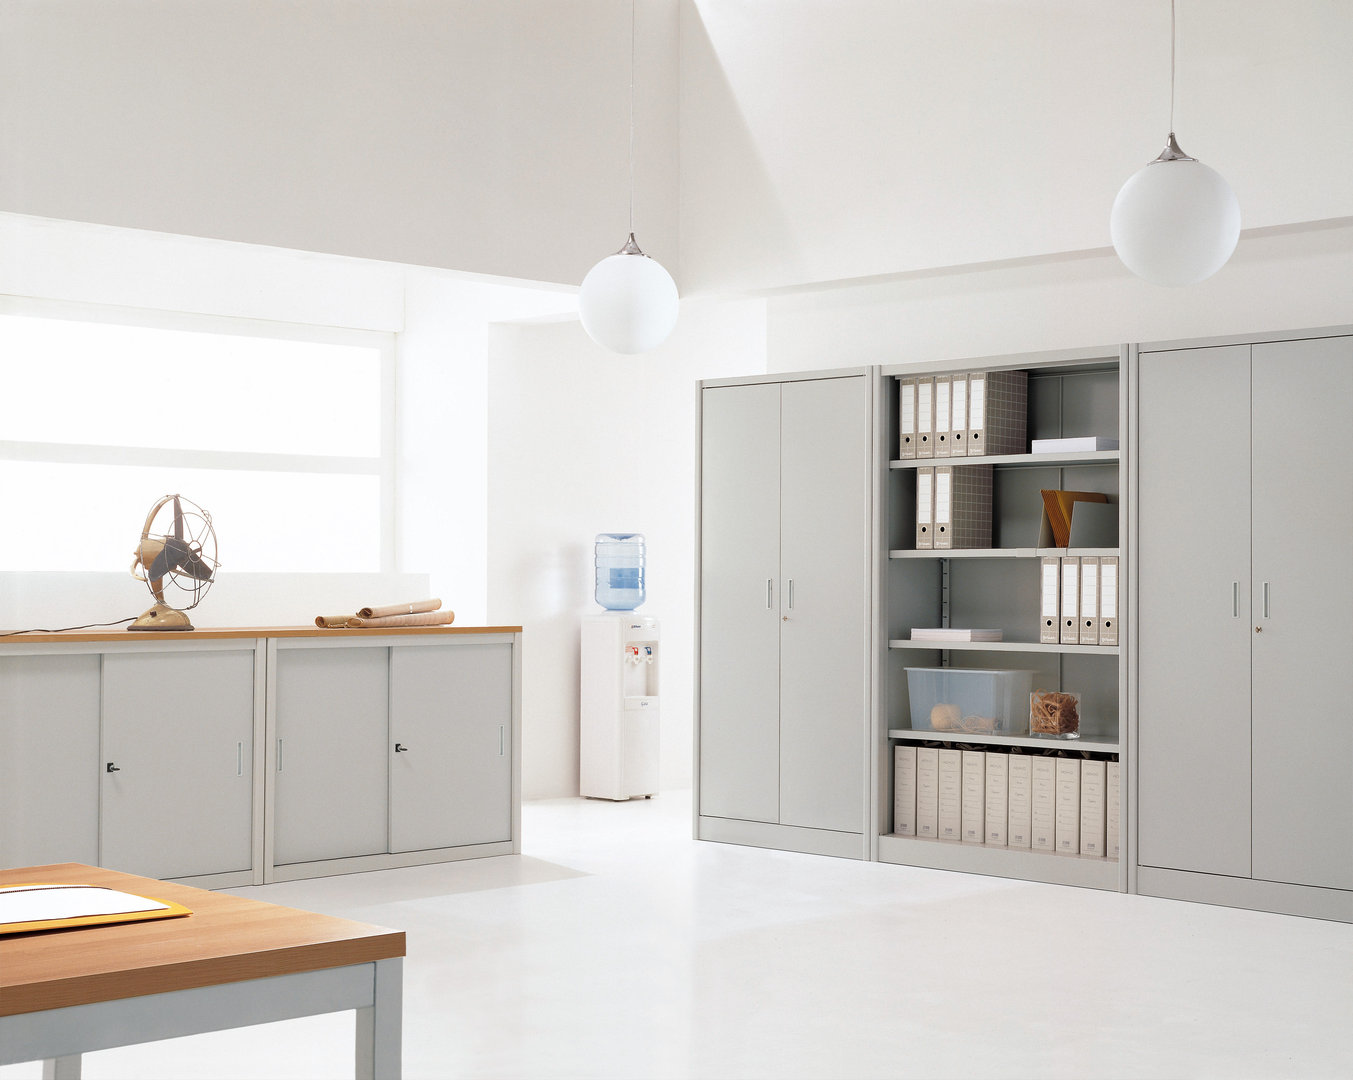 Basi cucina profondit ridotta beautiful awesome mobili da cucina profondita cm cucina compatta - Basi per cucina ...